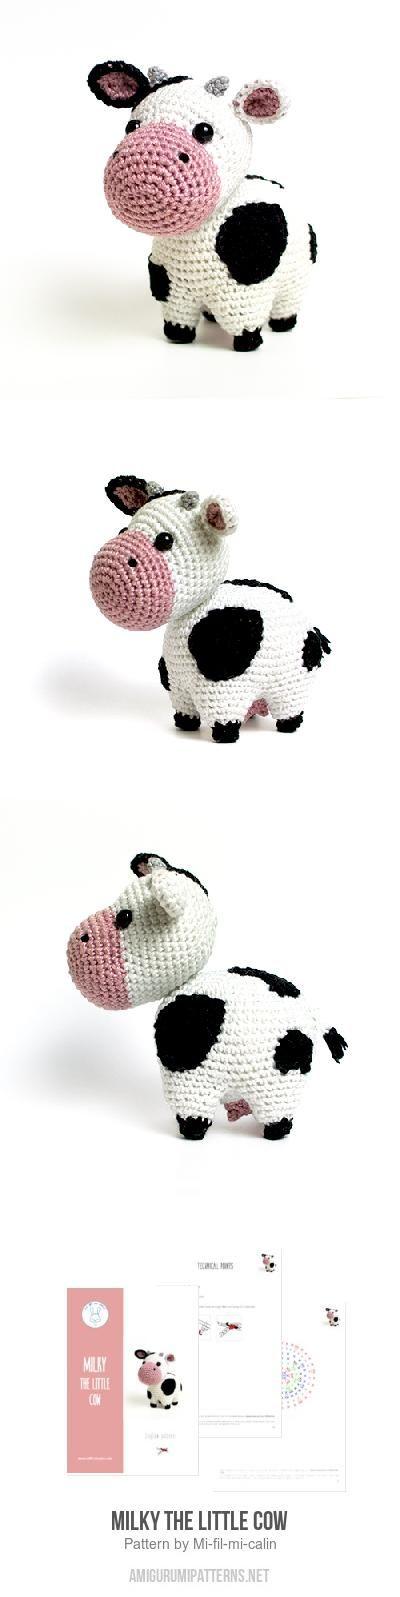 Milky the little cow amigurumi pattern | Yarny Goodness | Pinterest ...